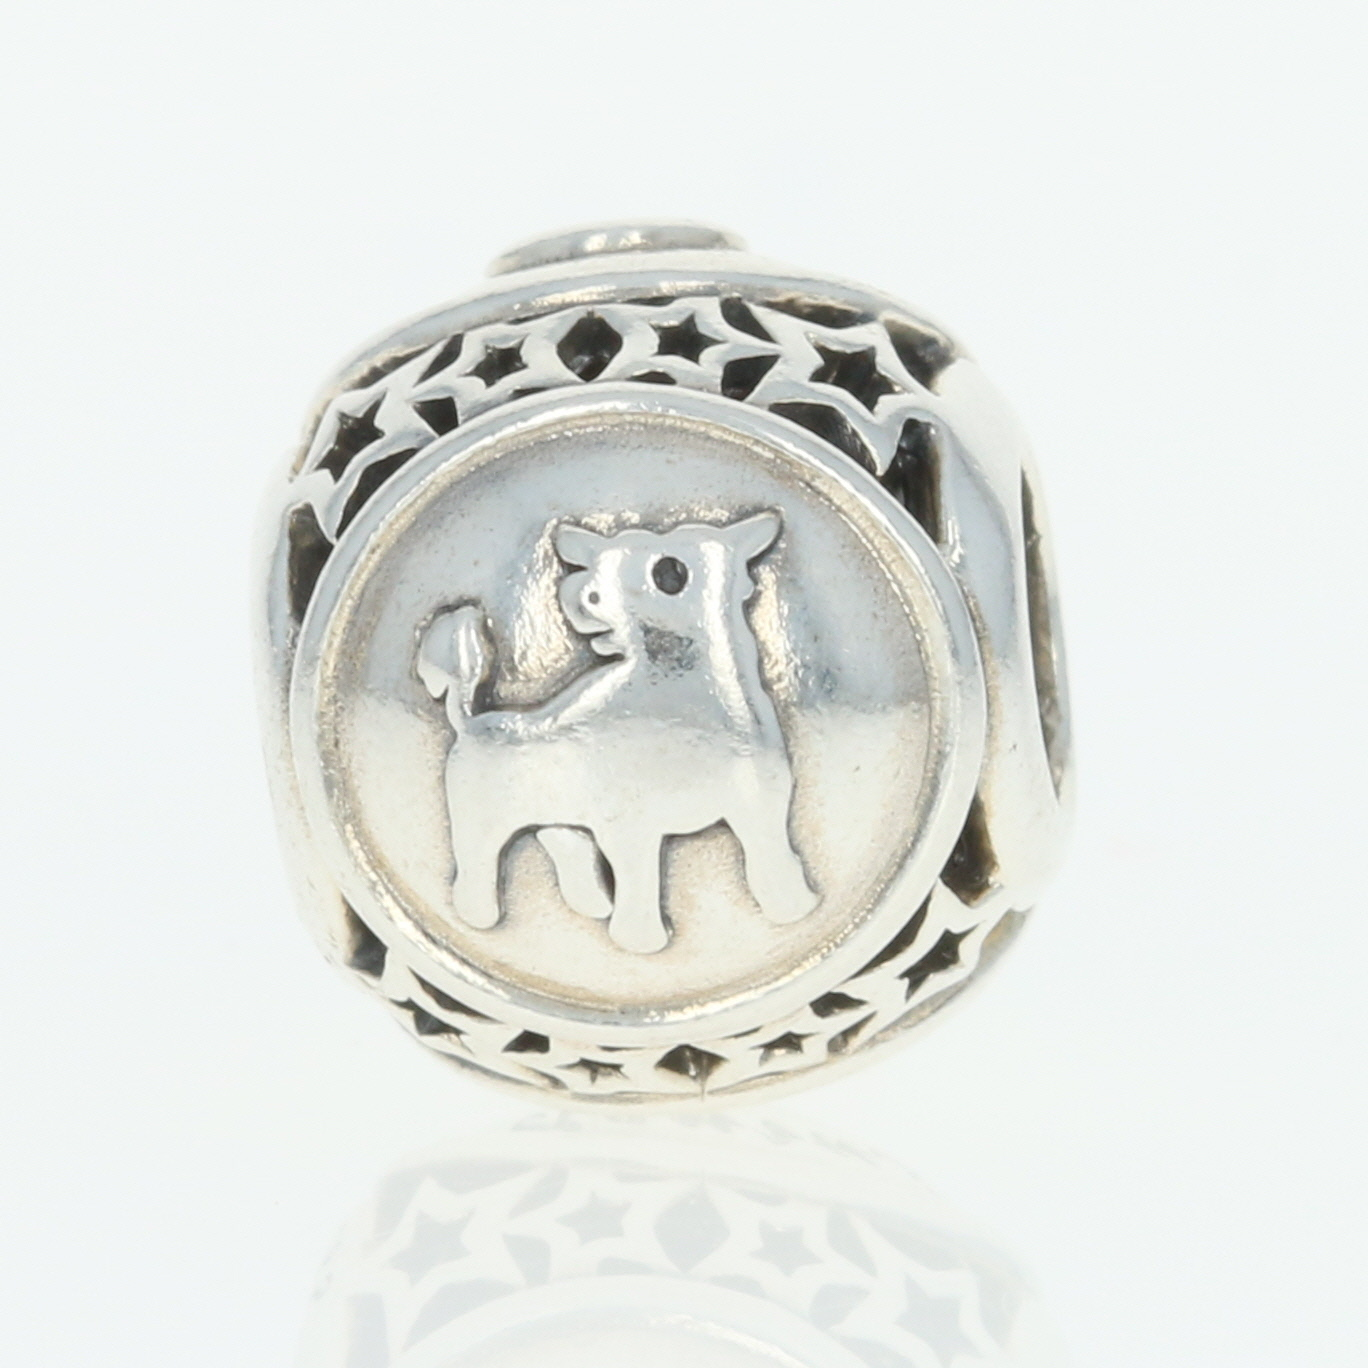 e0edc5c07 NEW Authentic Pandora Taurus Star Sign Charm Sterling Silver Zodiac ...